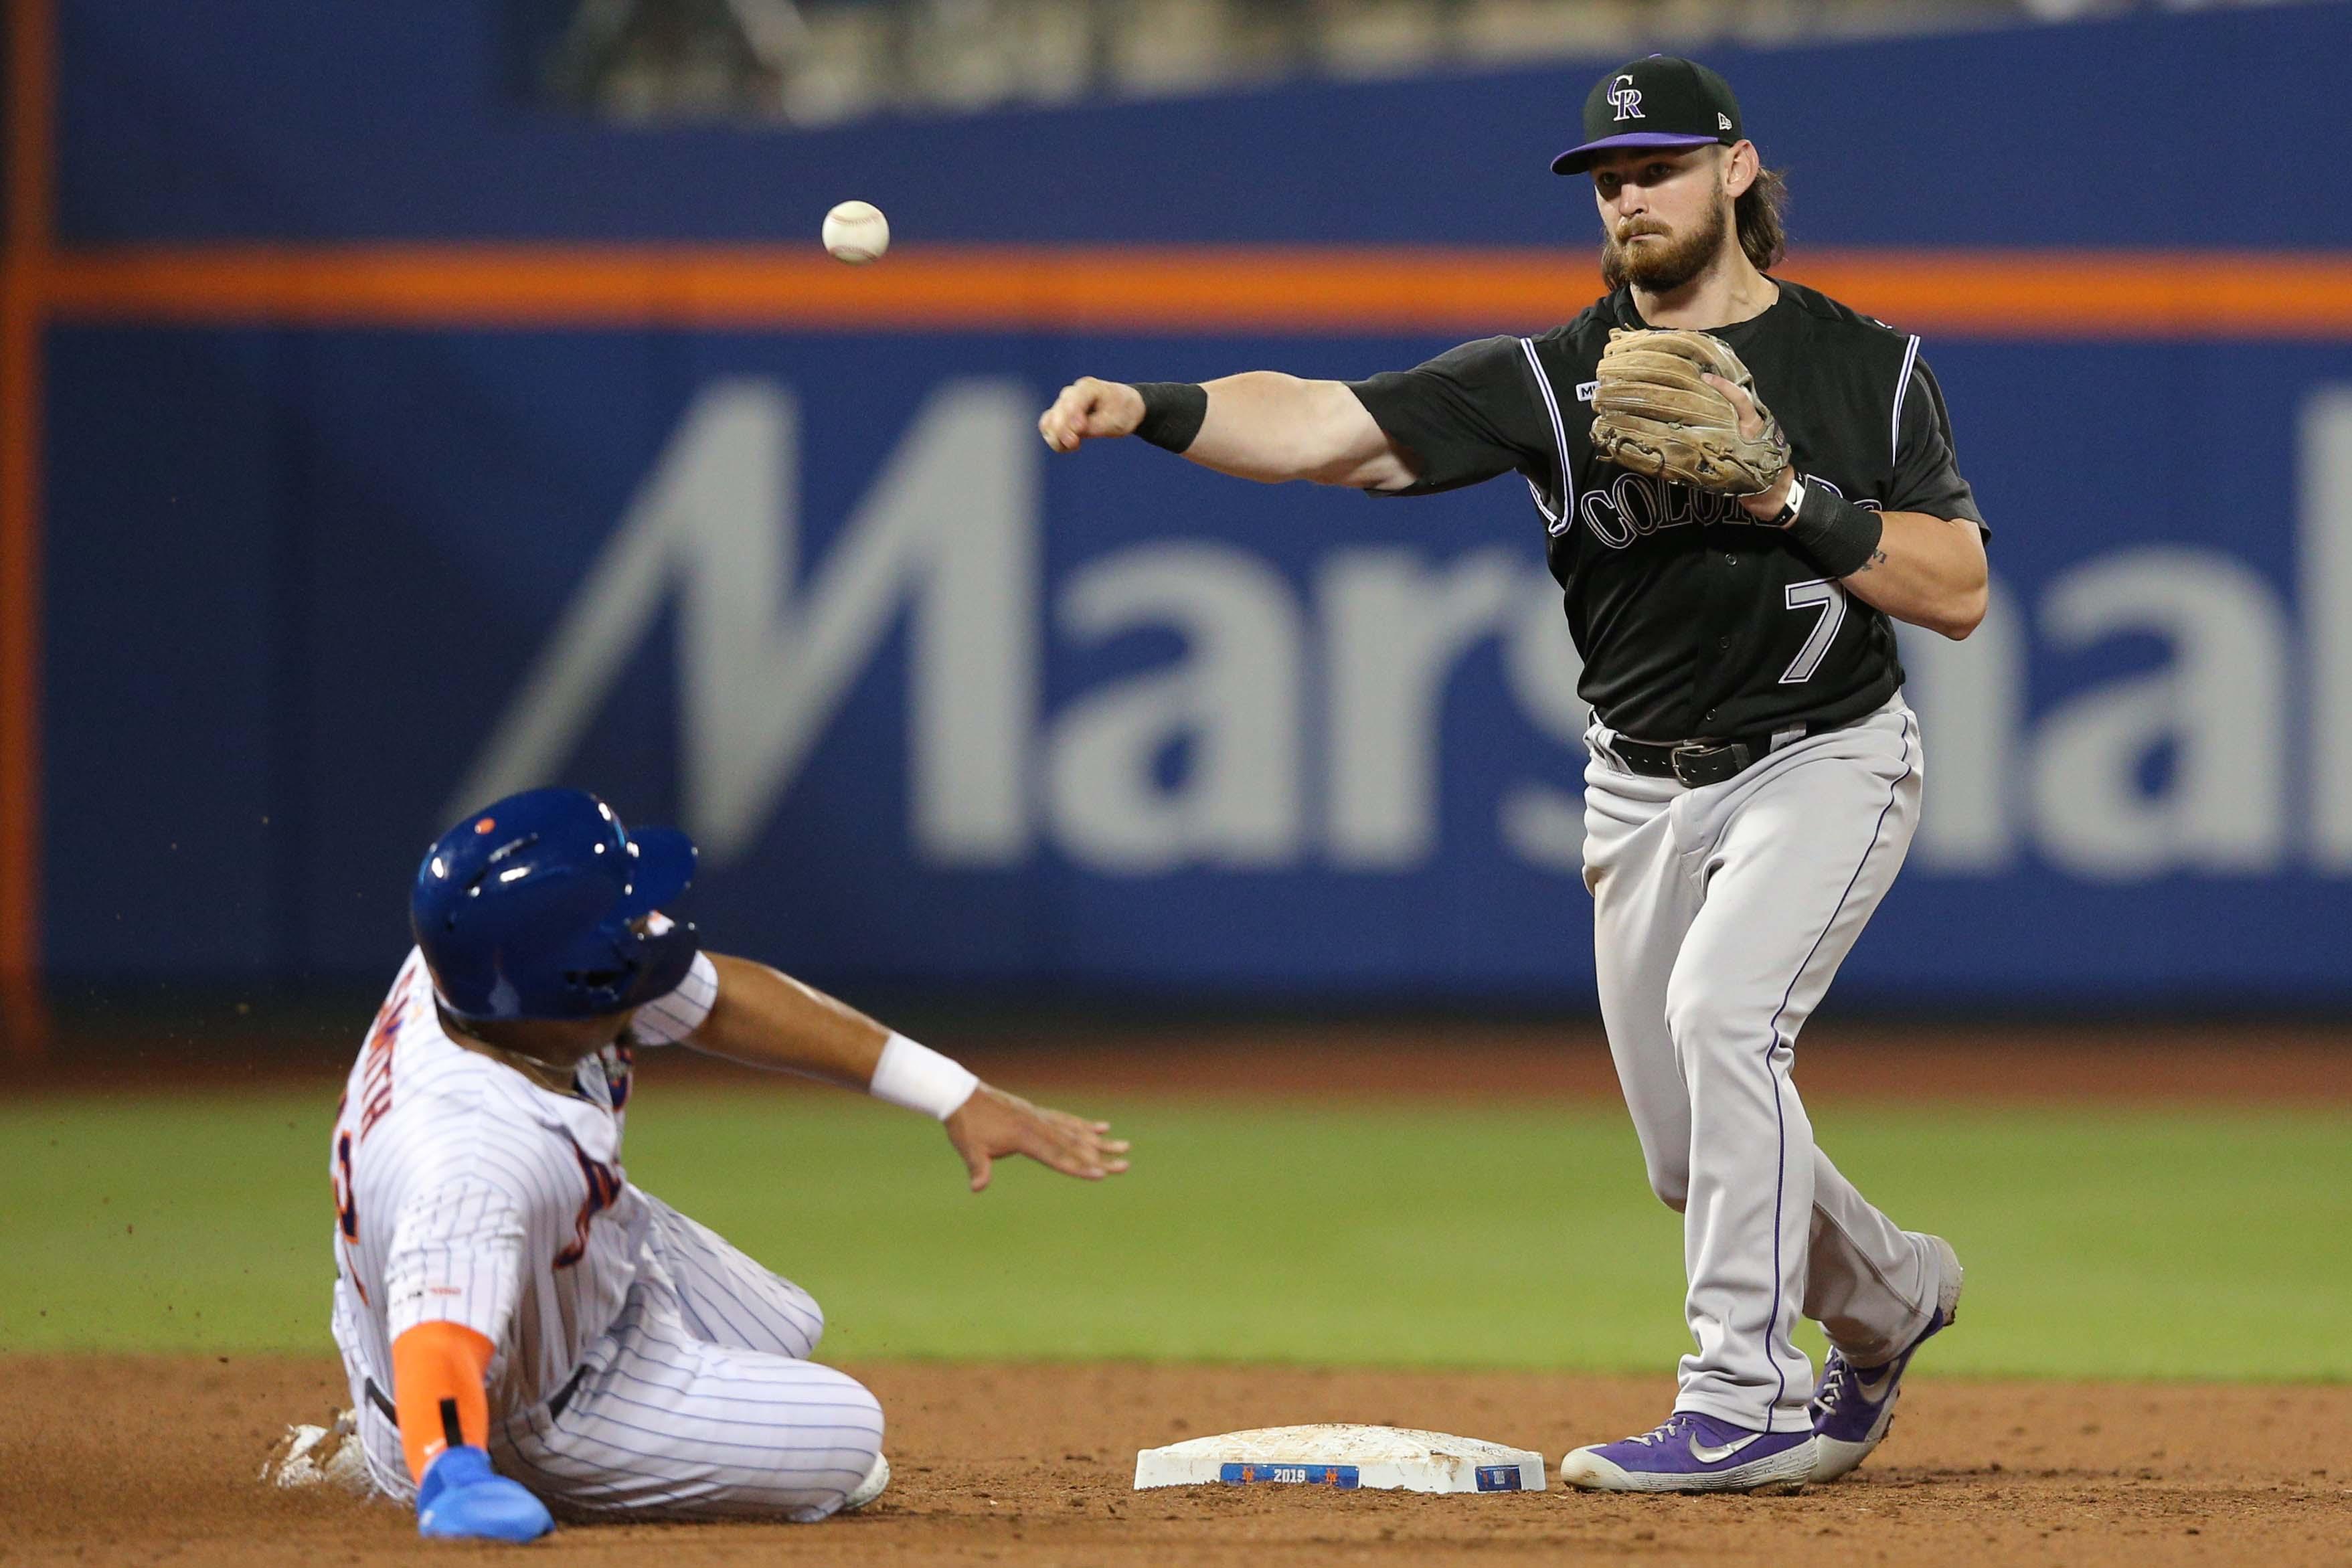 6/8/19 Game Preview: Colorado Rockies at New York Mets